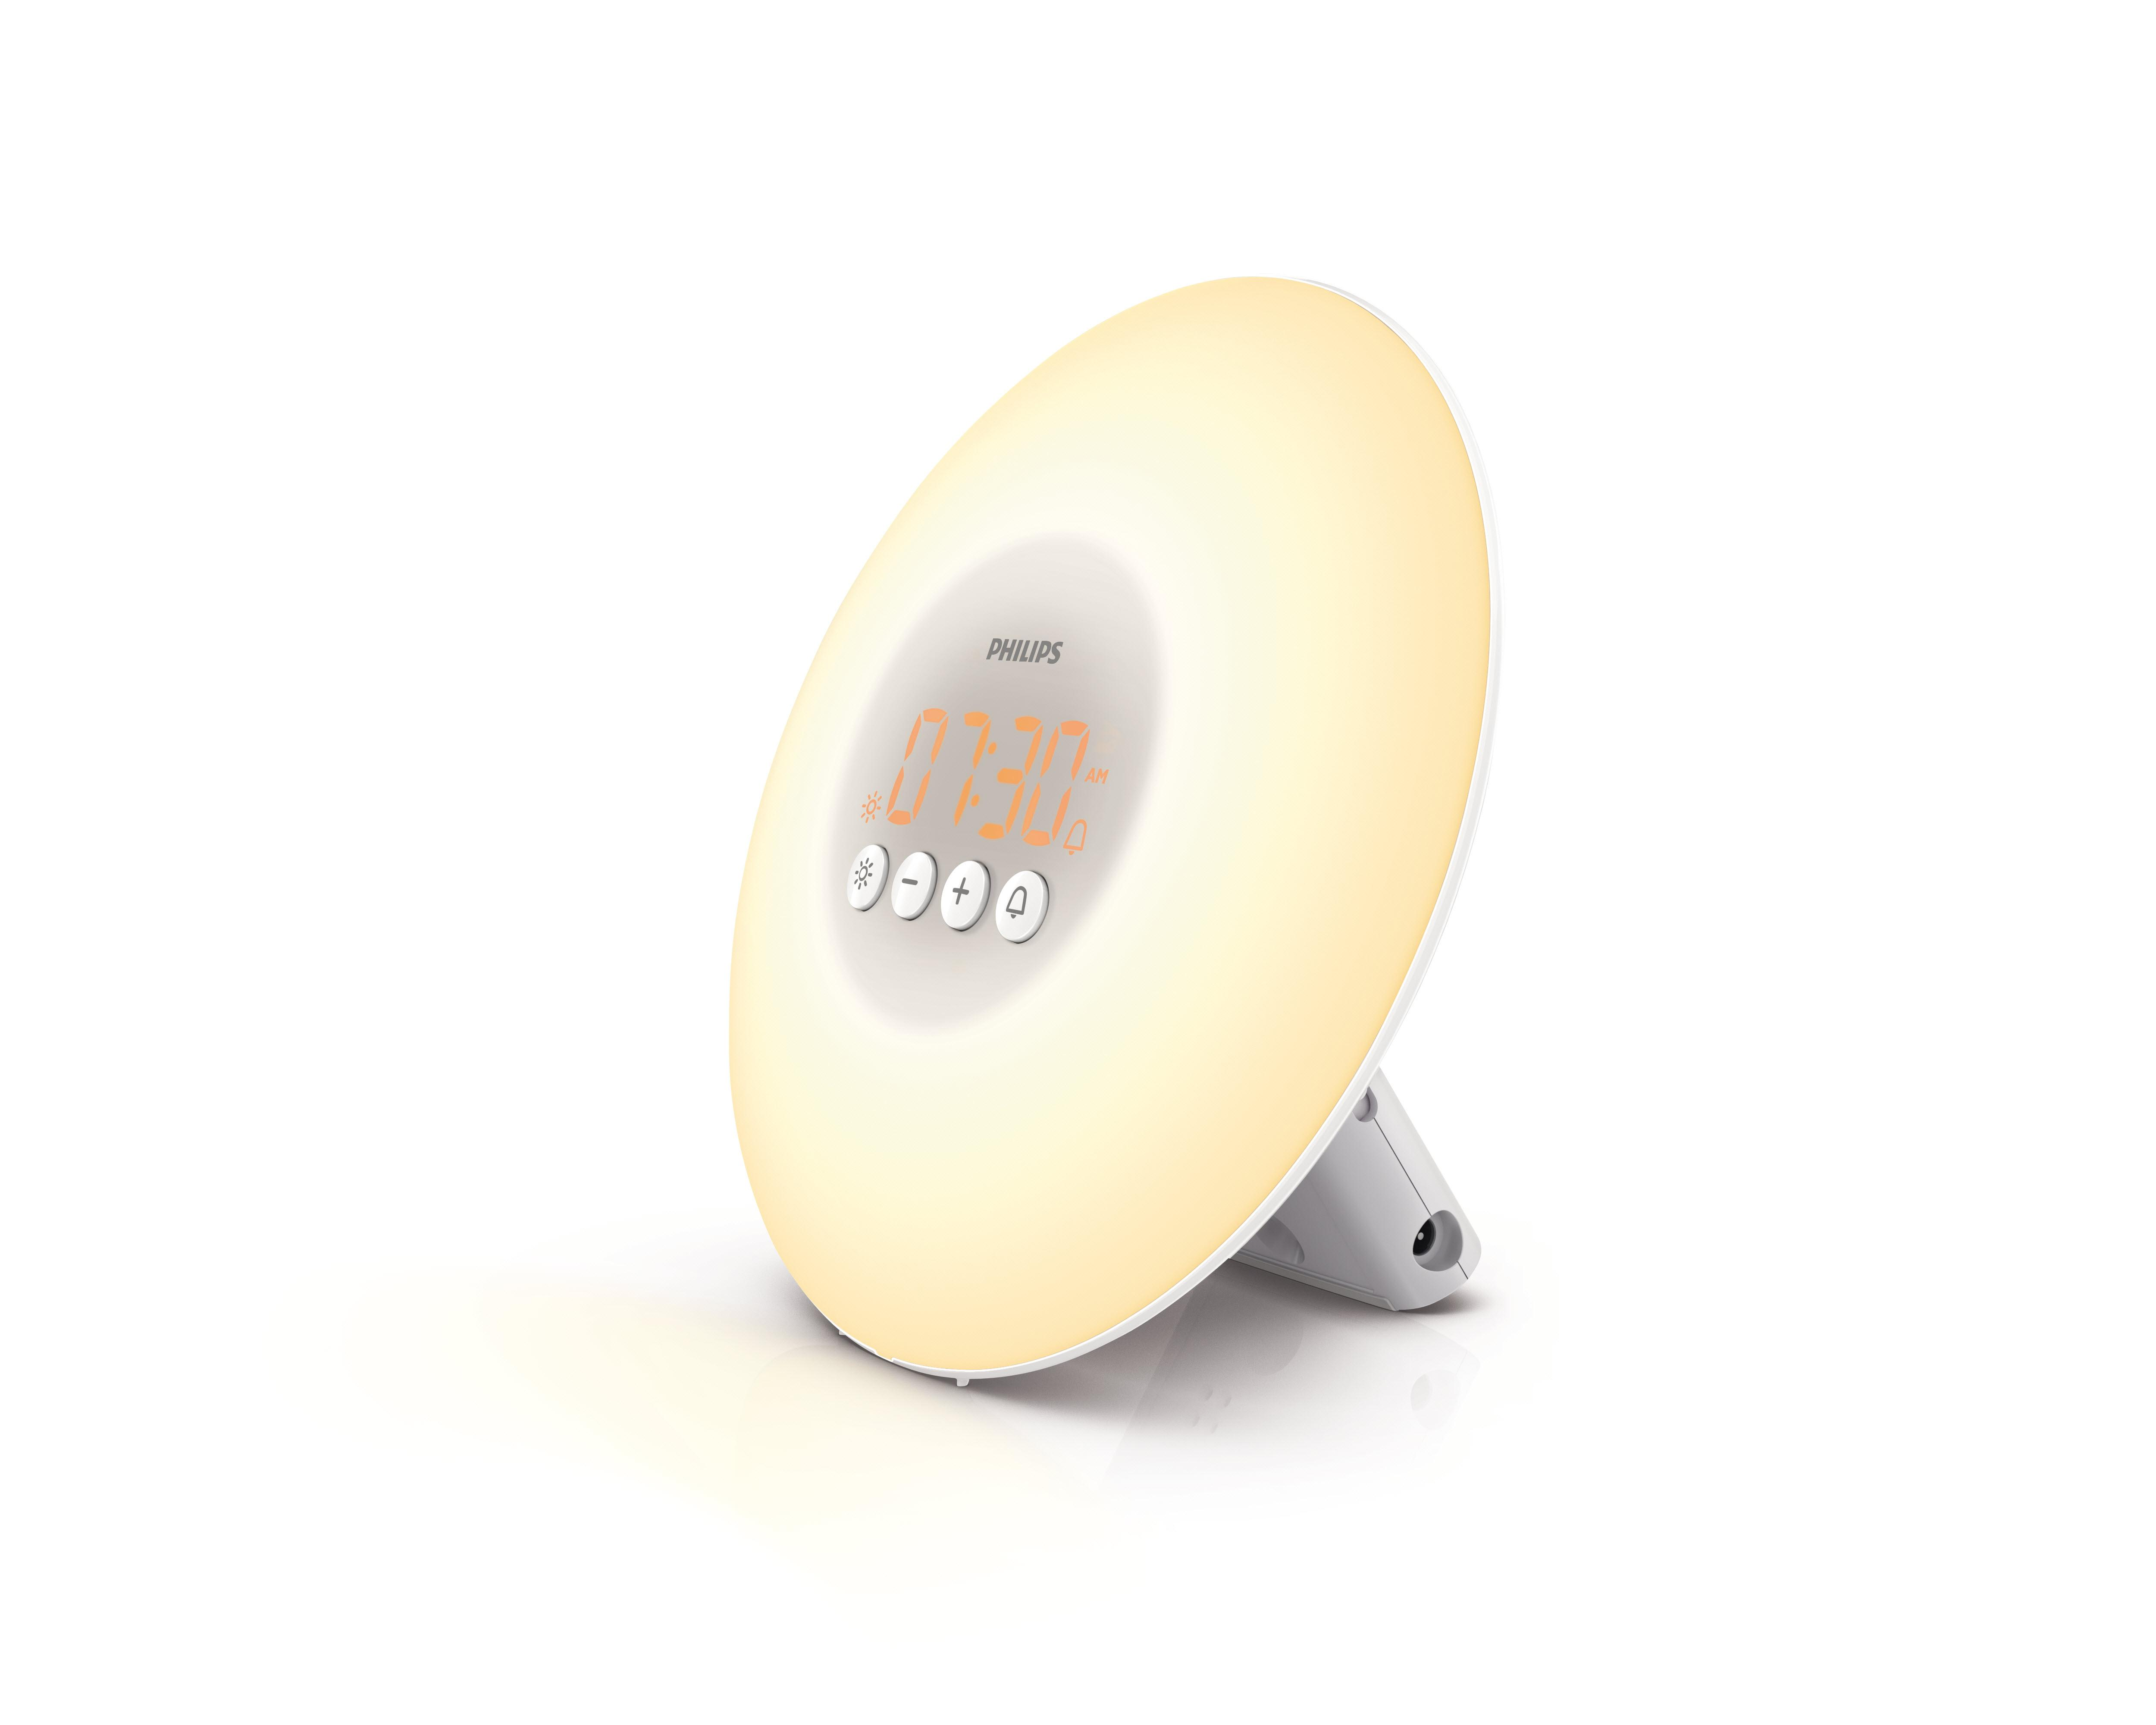 philips wake up light white health. Black Bedroom Furniture Sets. Home Design Ideas